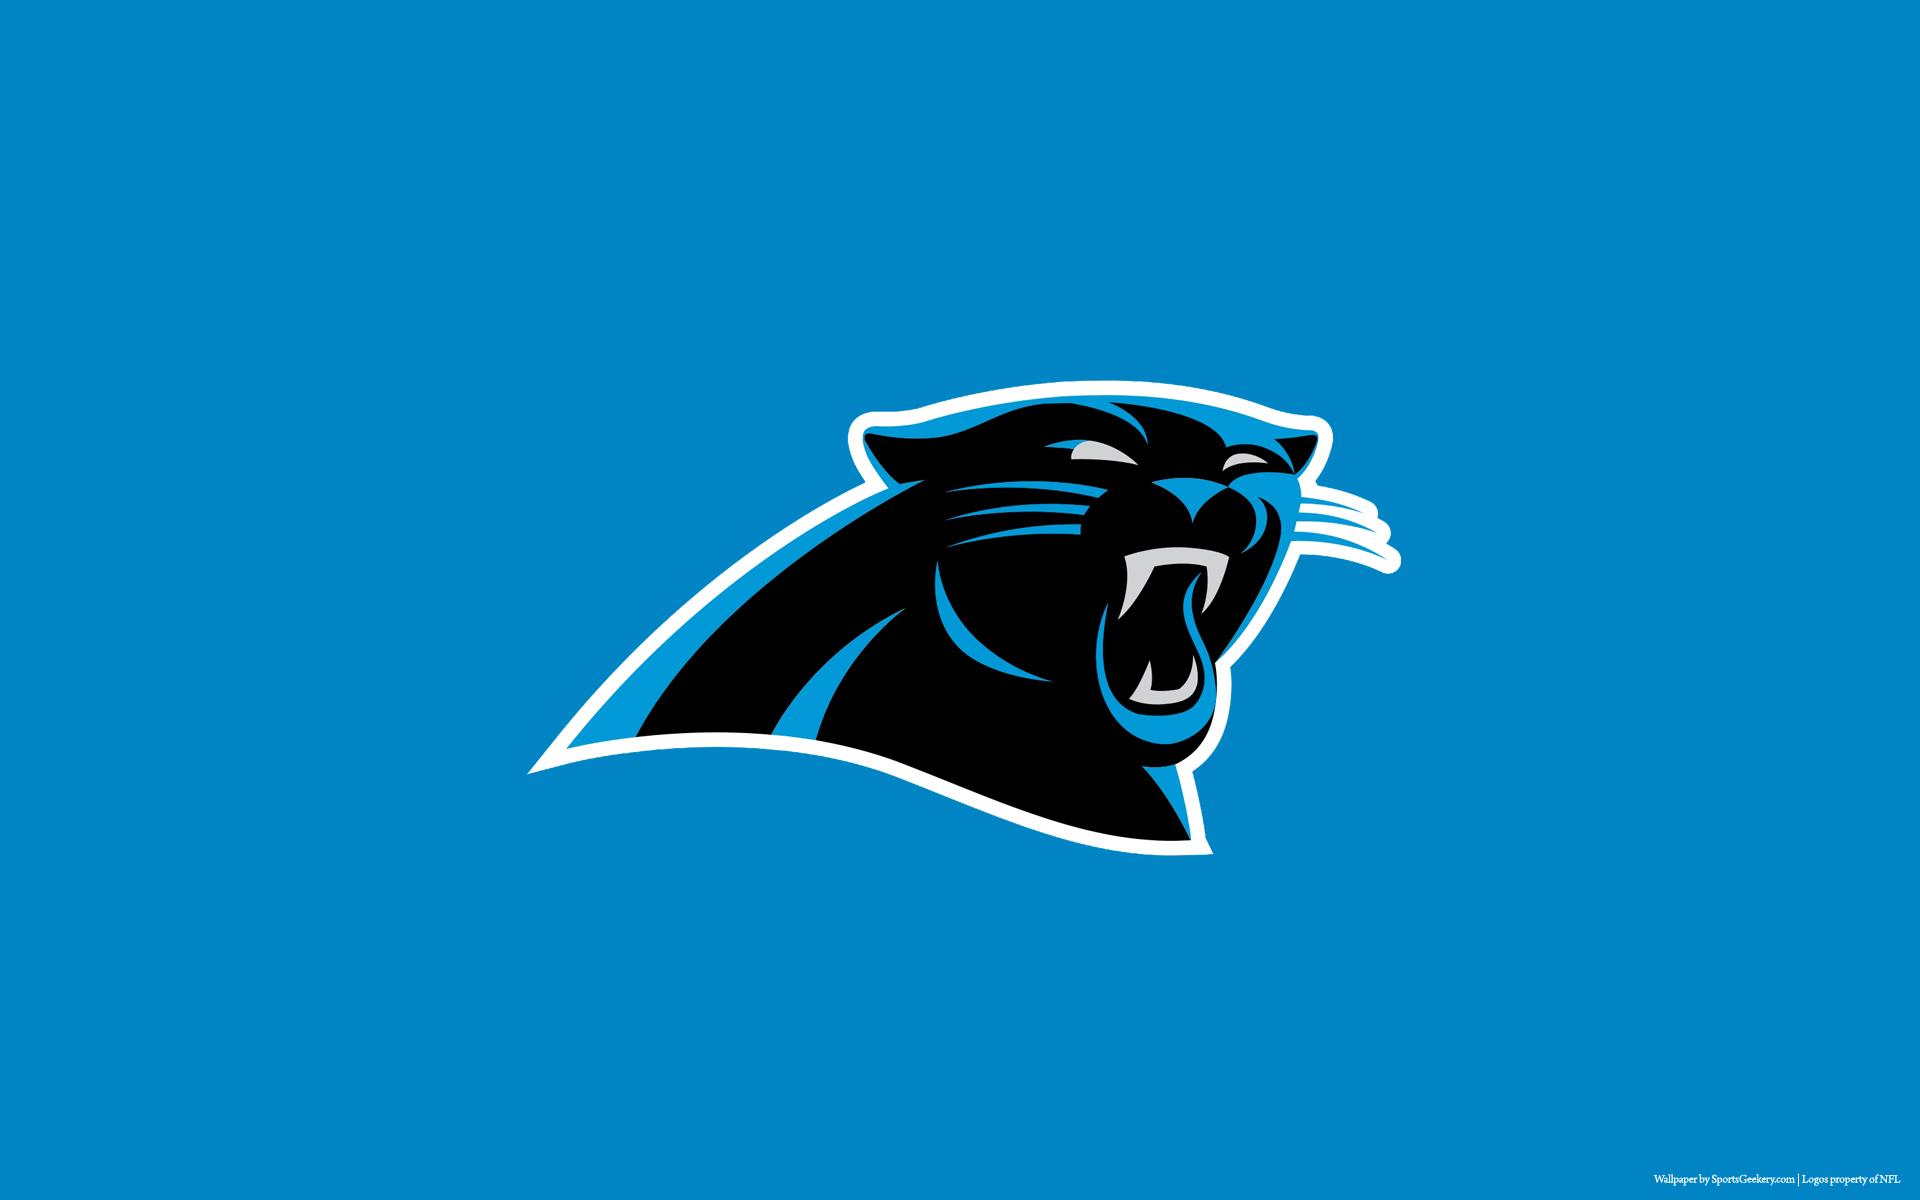 Carolina Panthers Blue Wallpaper for Nook HD 1920x1200